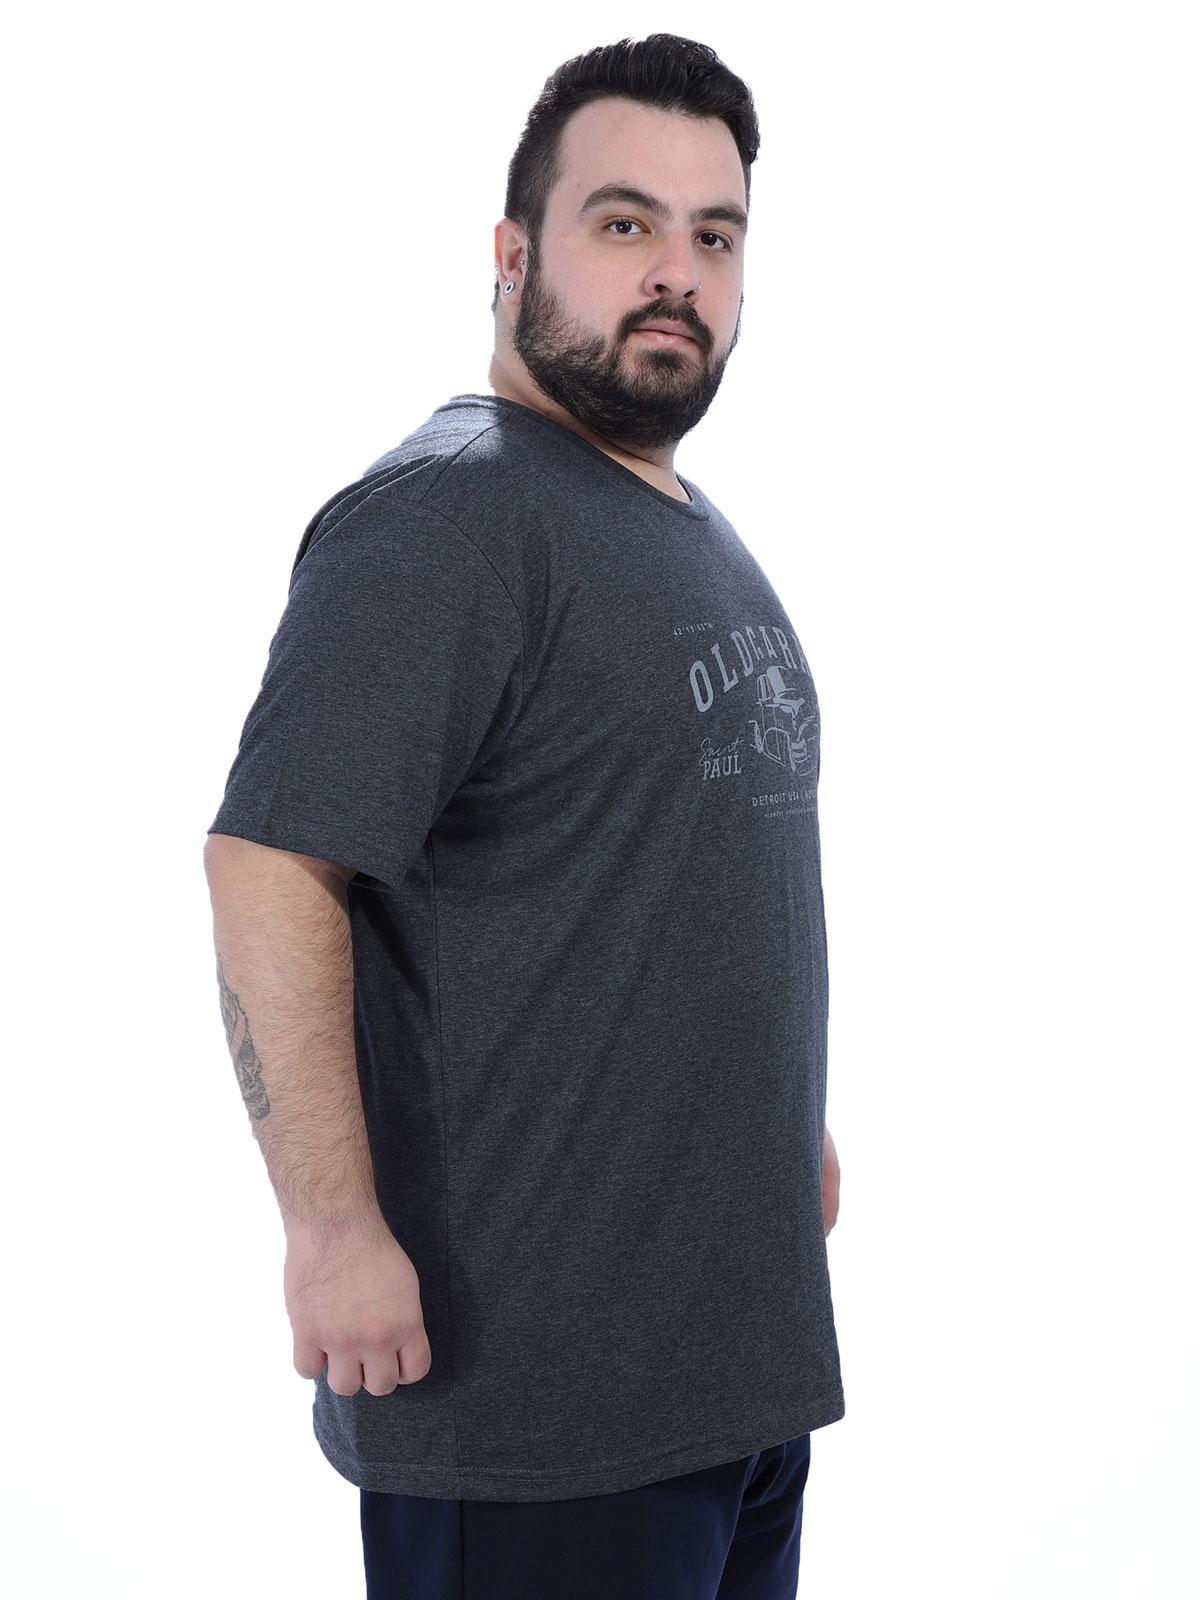 Camiseta Plus Size Masculino Garage Anistia Mescla